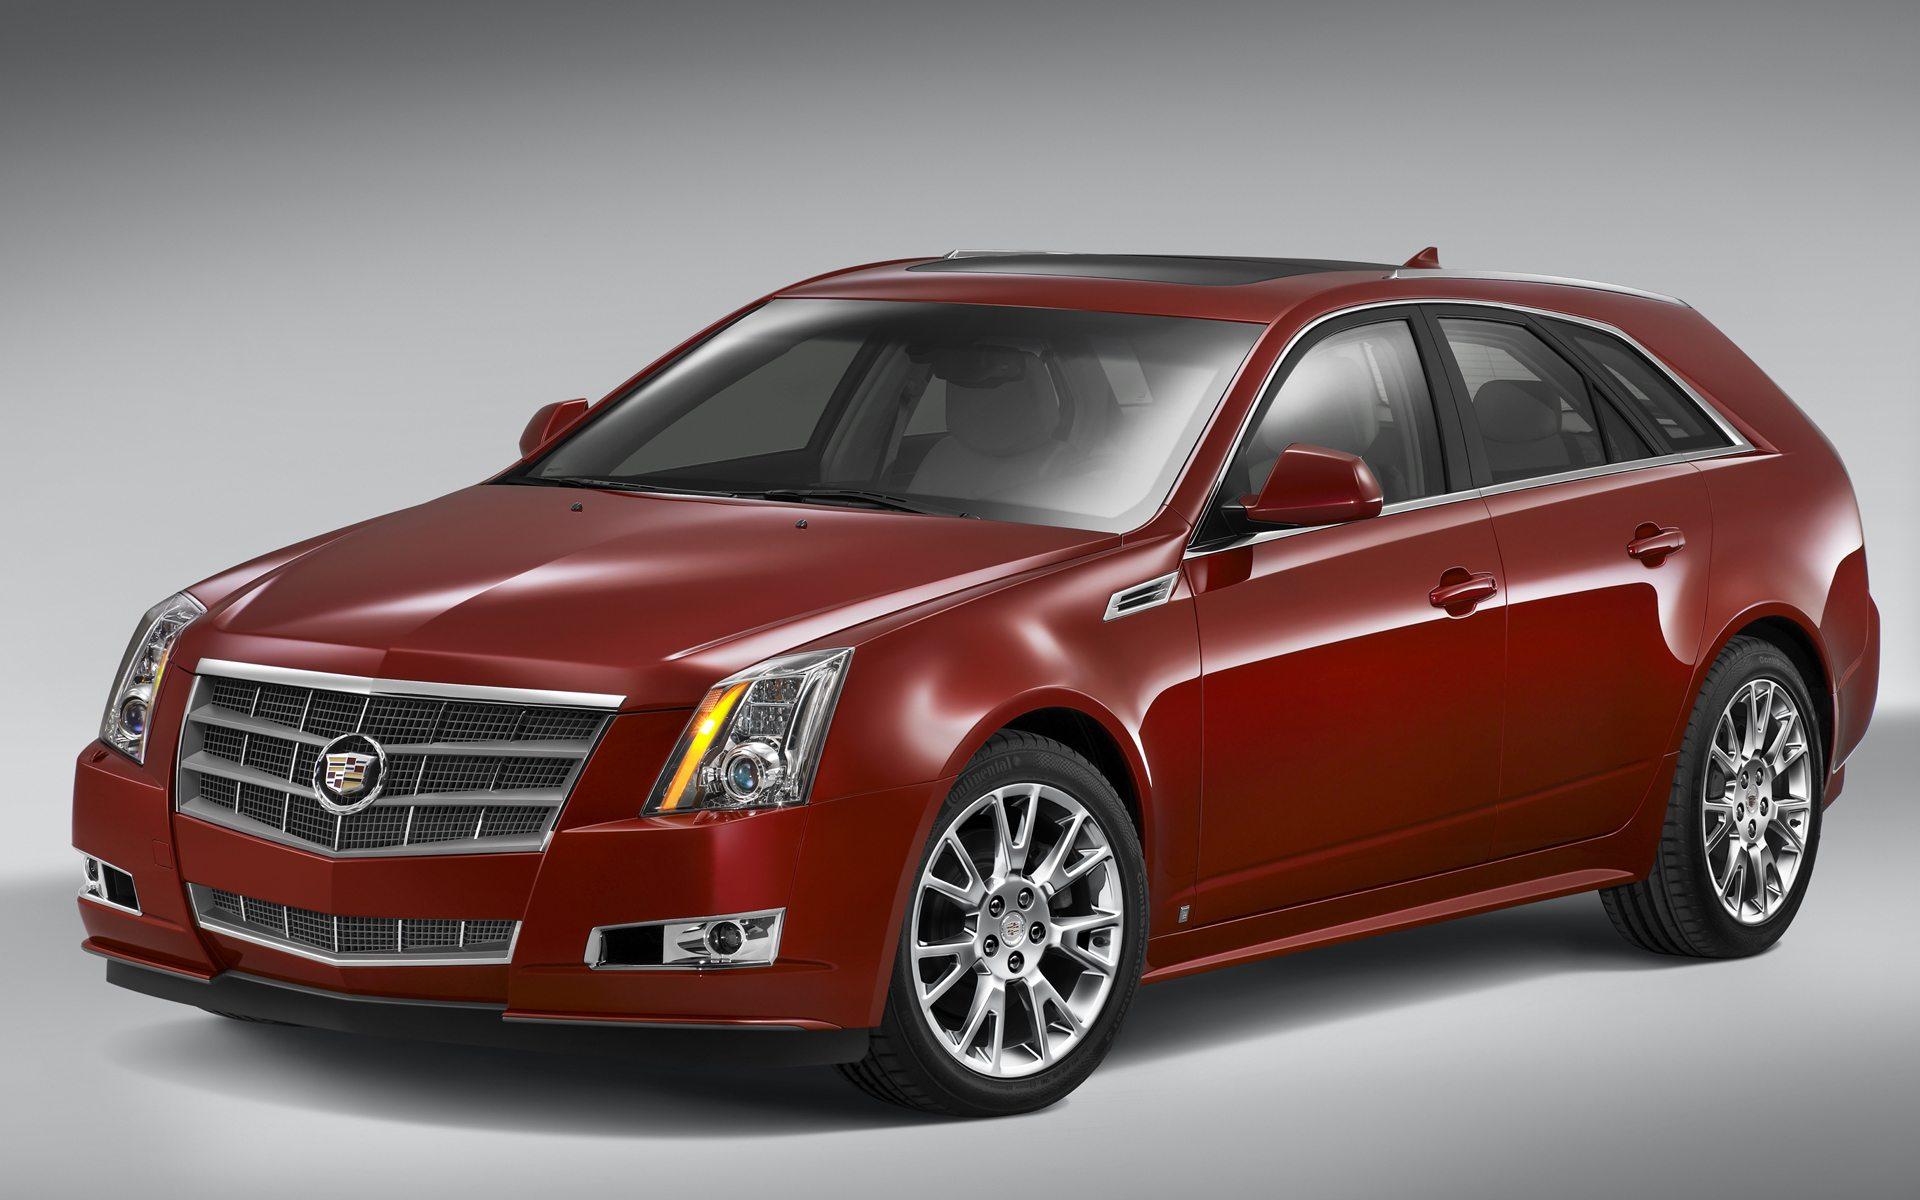 Автомобиль Cadillac CTS